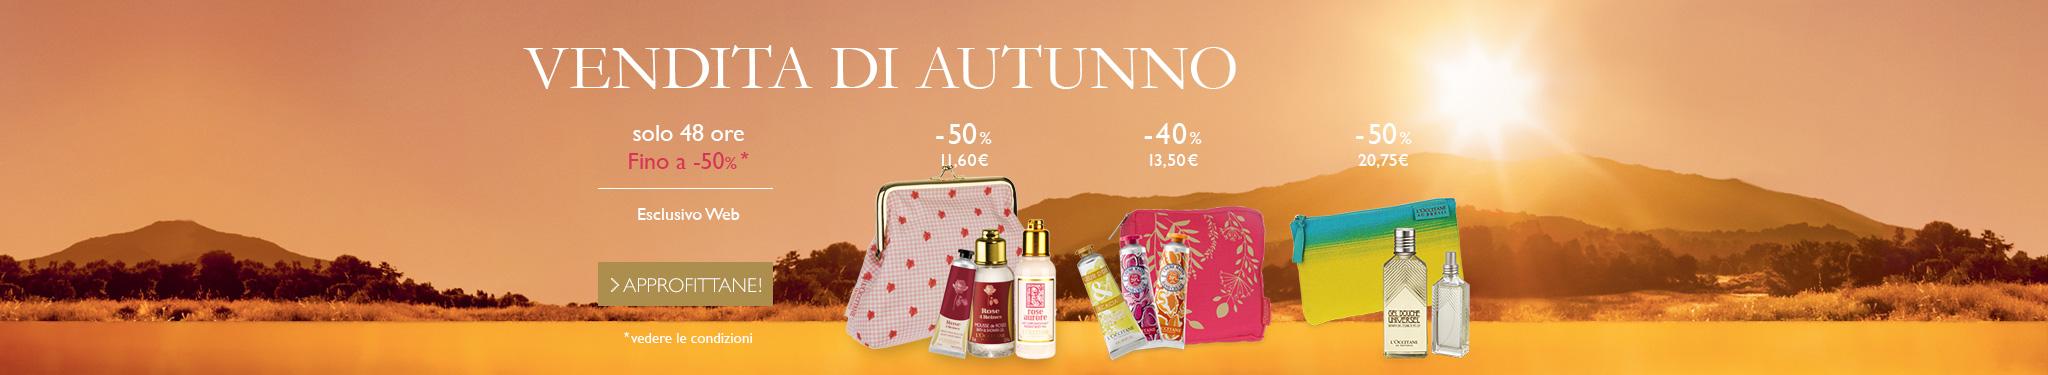 vendita d'autunno